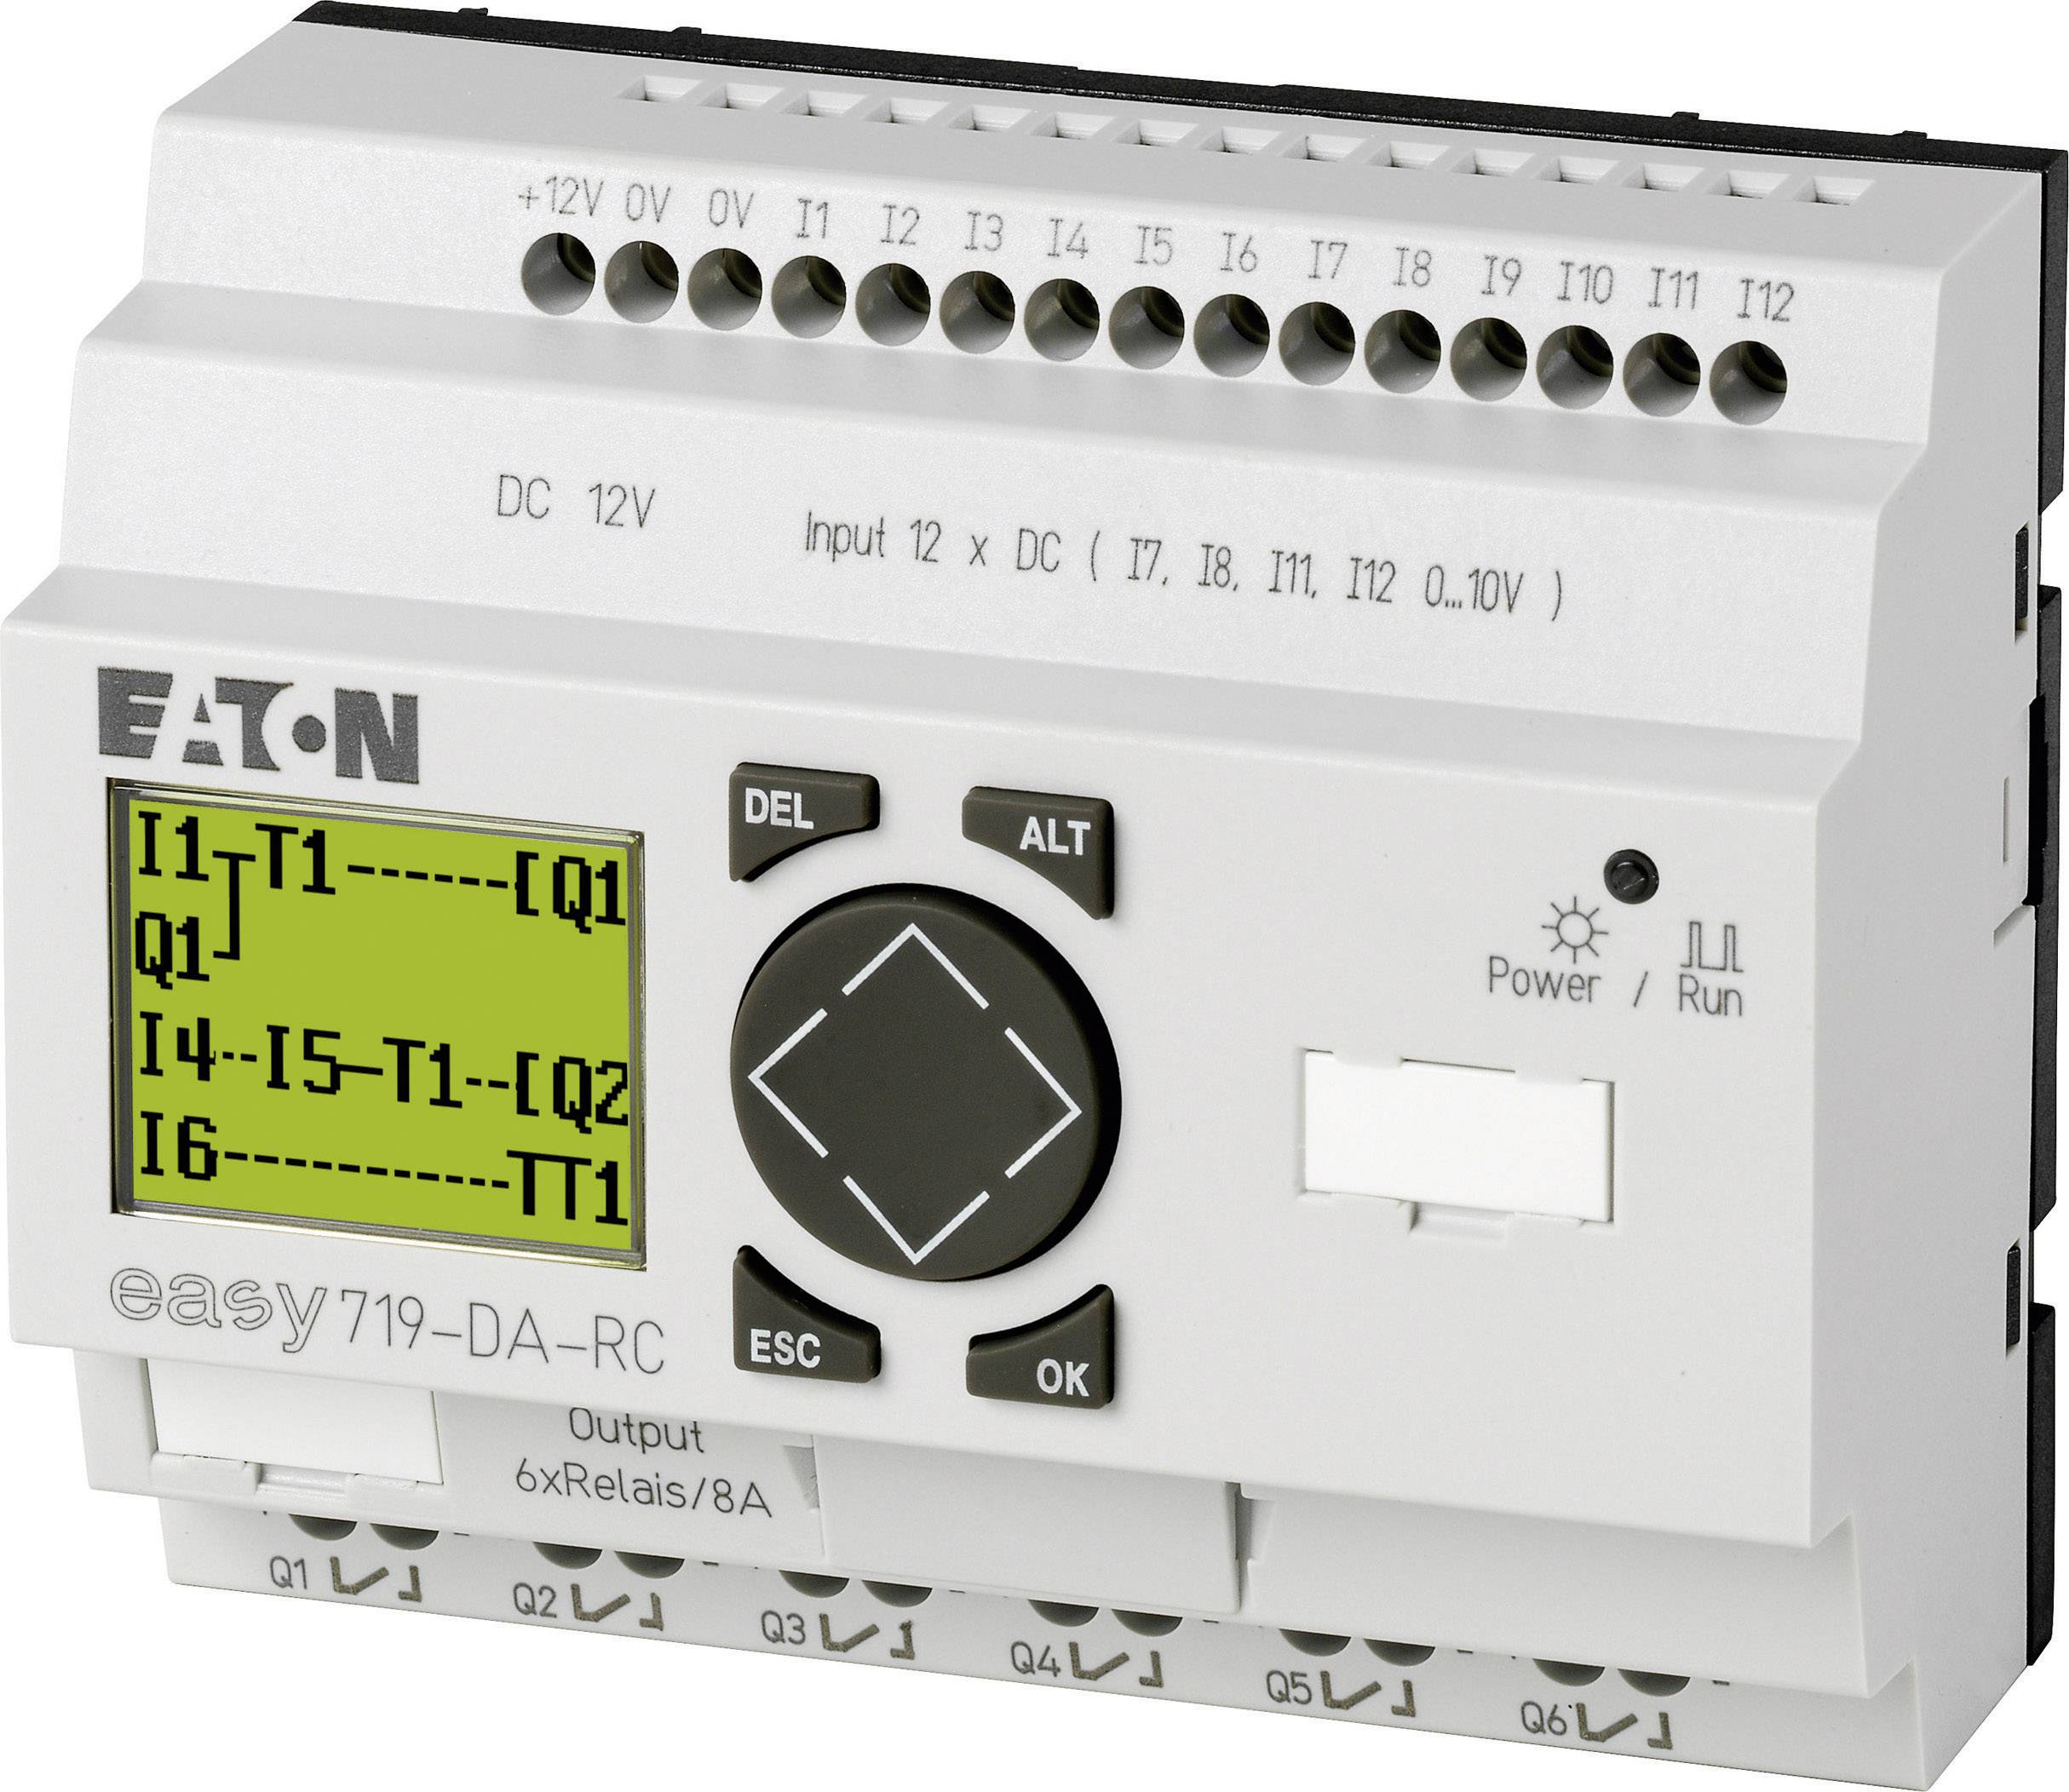 Riadiacimodul Eaton easy 719-DA-RC 274117, 12 V/DC